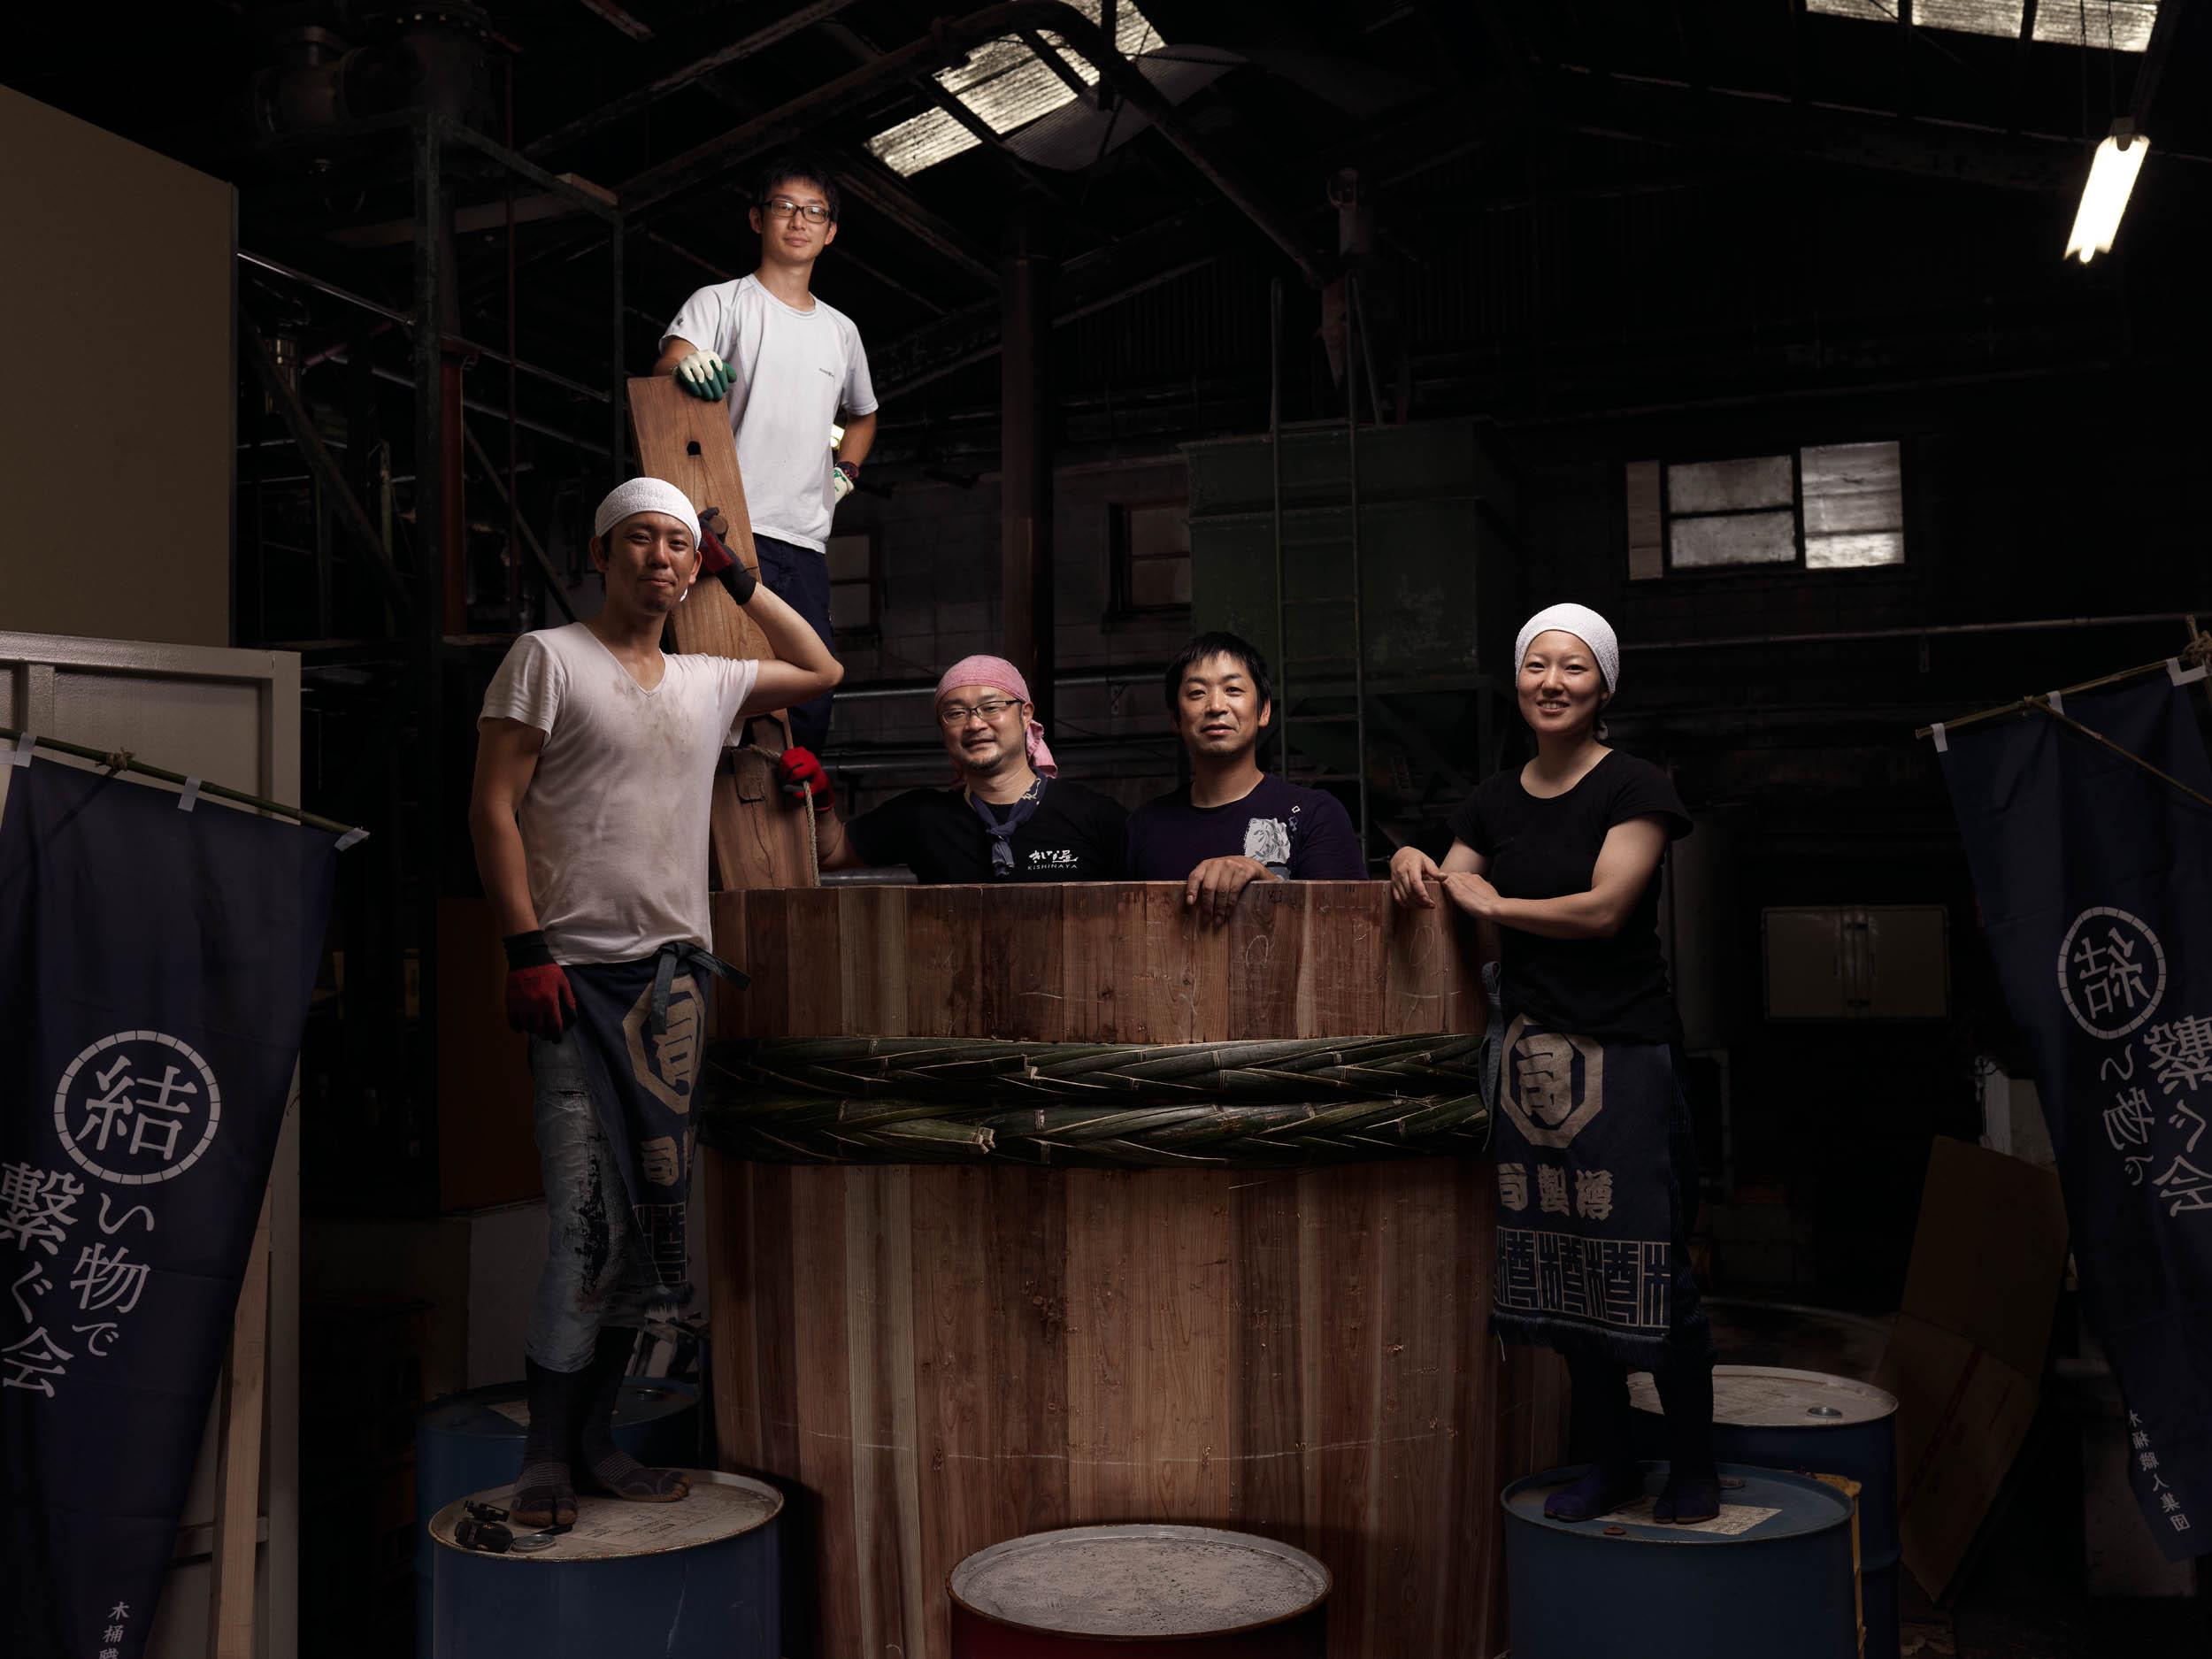 2018 09 07 - Fueki Syoyu Brewing_2.jpg